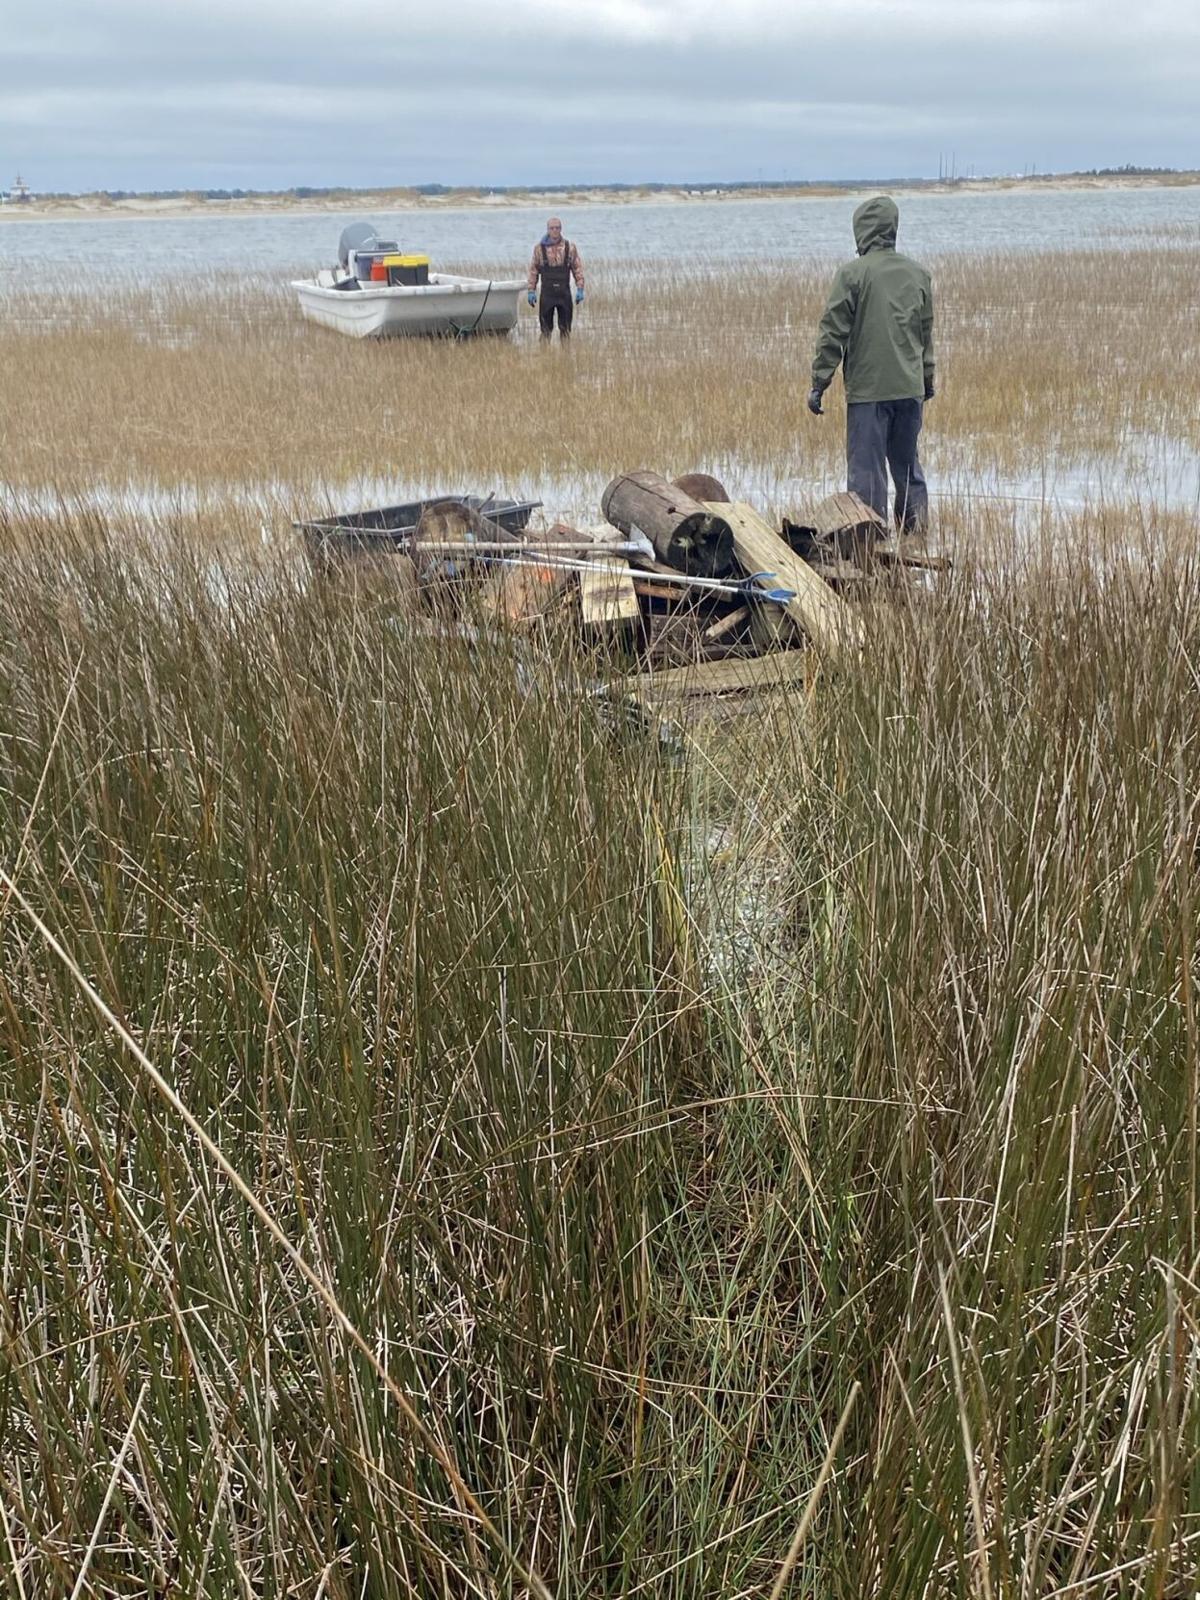 NC Coastal Federation, volunteers celebrate removing more than 1.8M pounds of marine debris